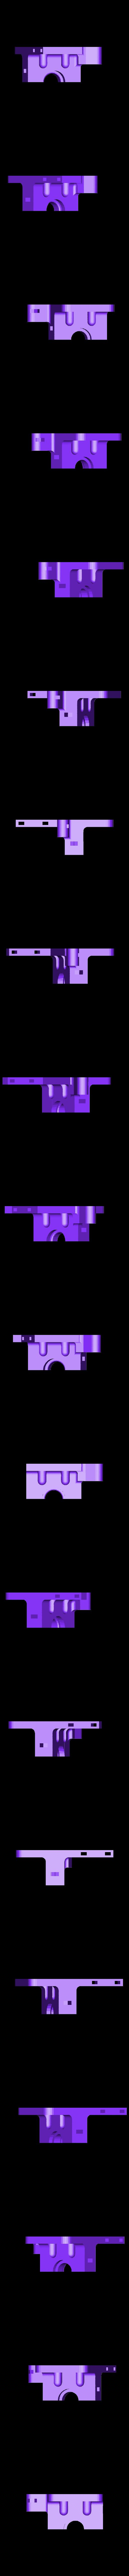 bMGN9H_for_e3d_v6_base_v2.stl Download free STL file Holder for e3d v6 hotend to MGN9H carrier • Design to 3D print, tigorlab